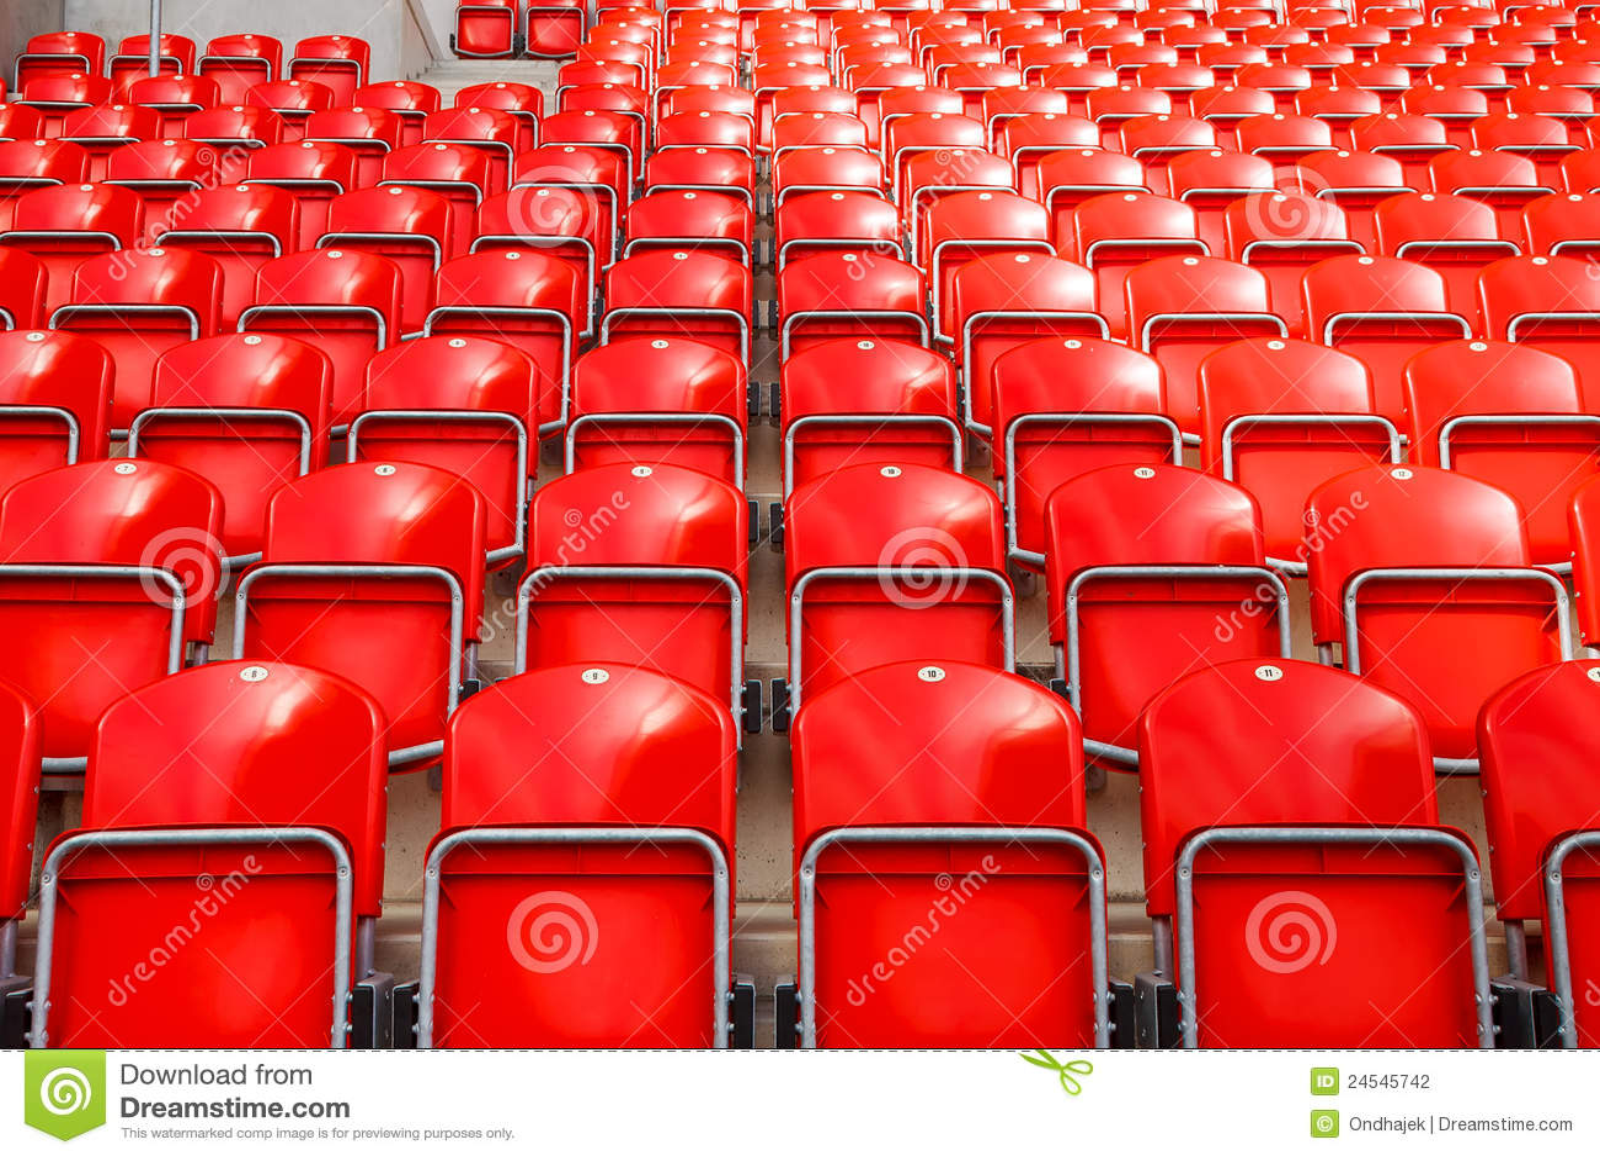 soccer stadium stock photo  image of empty  grass  bench